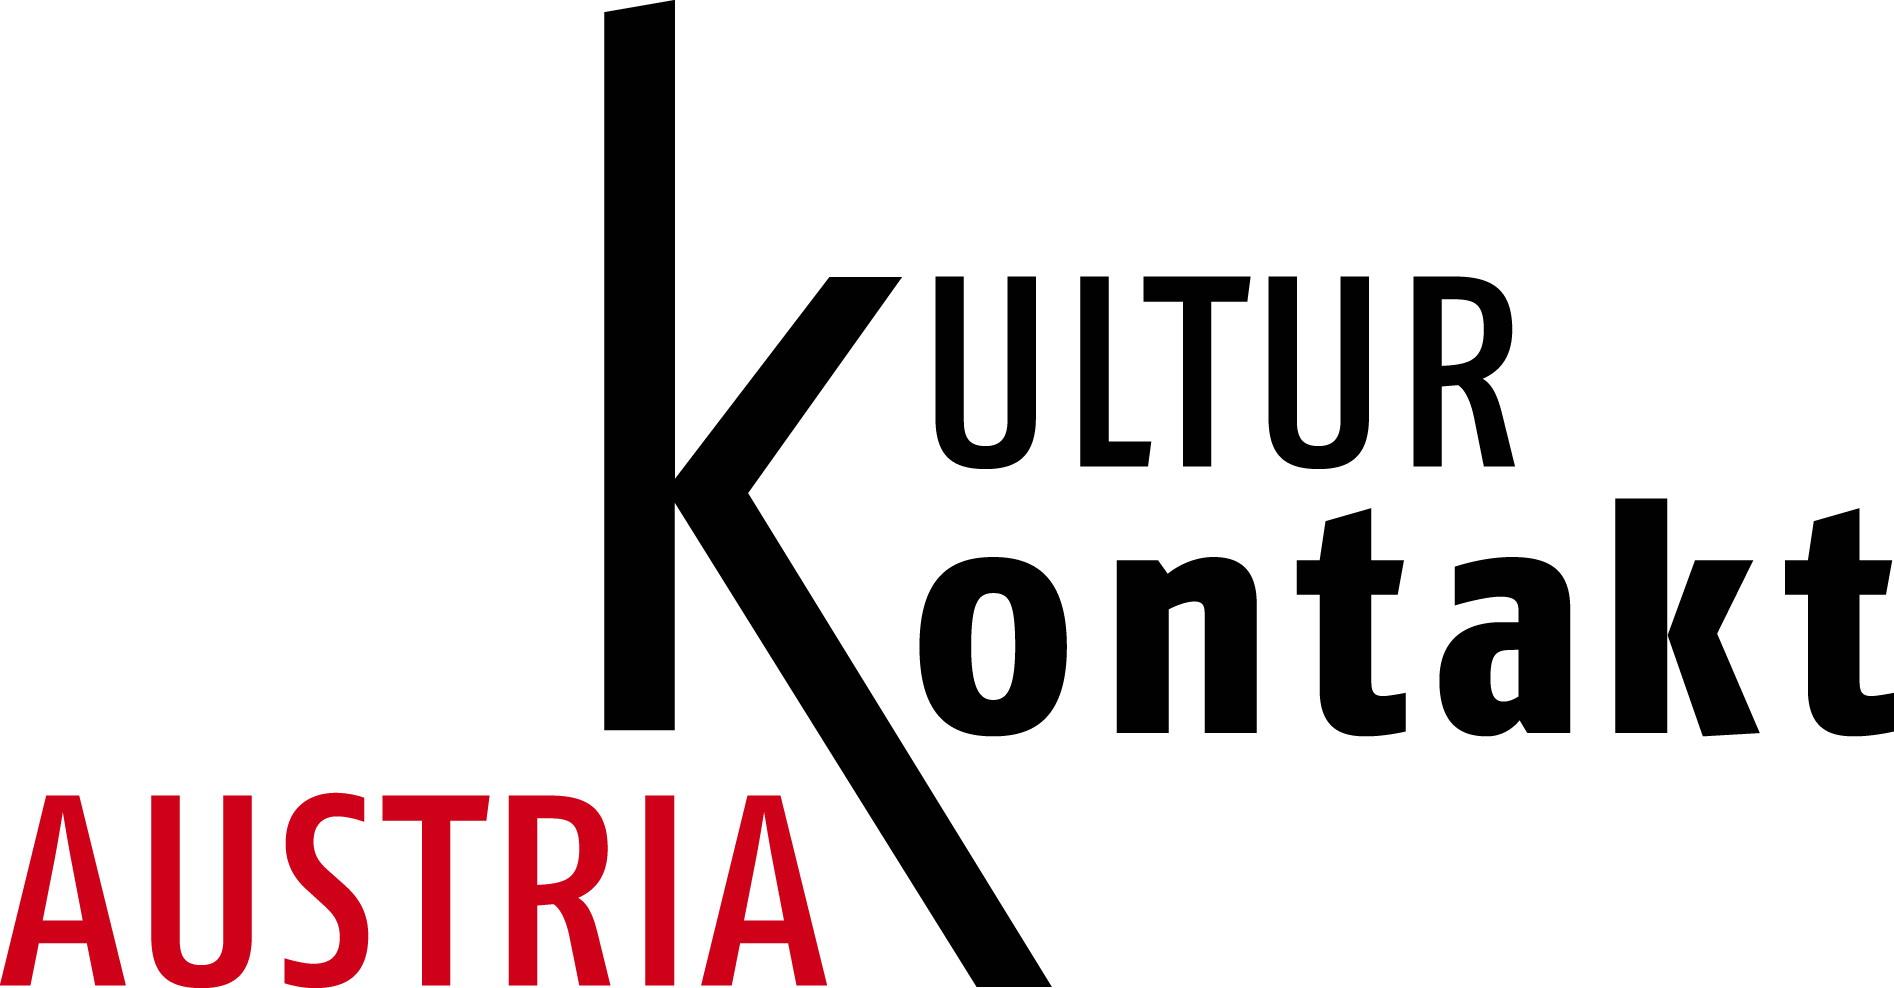 KulturKontakt_Austria